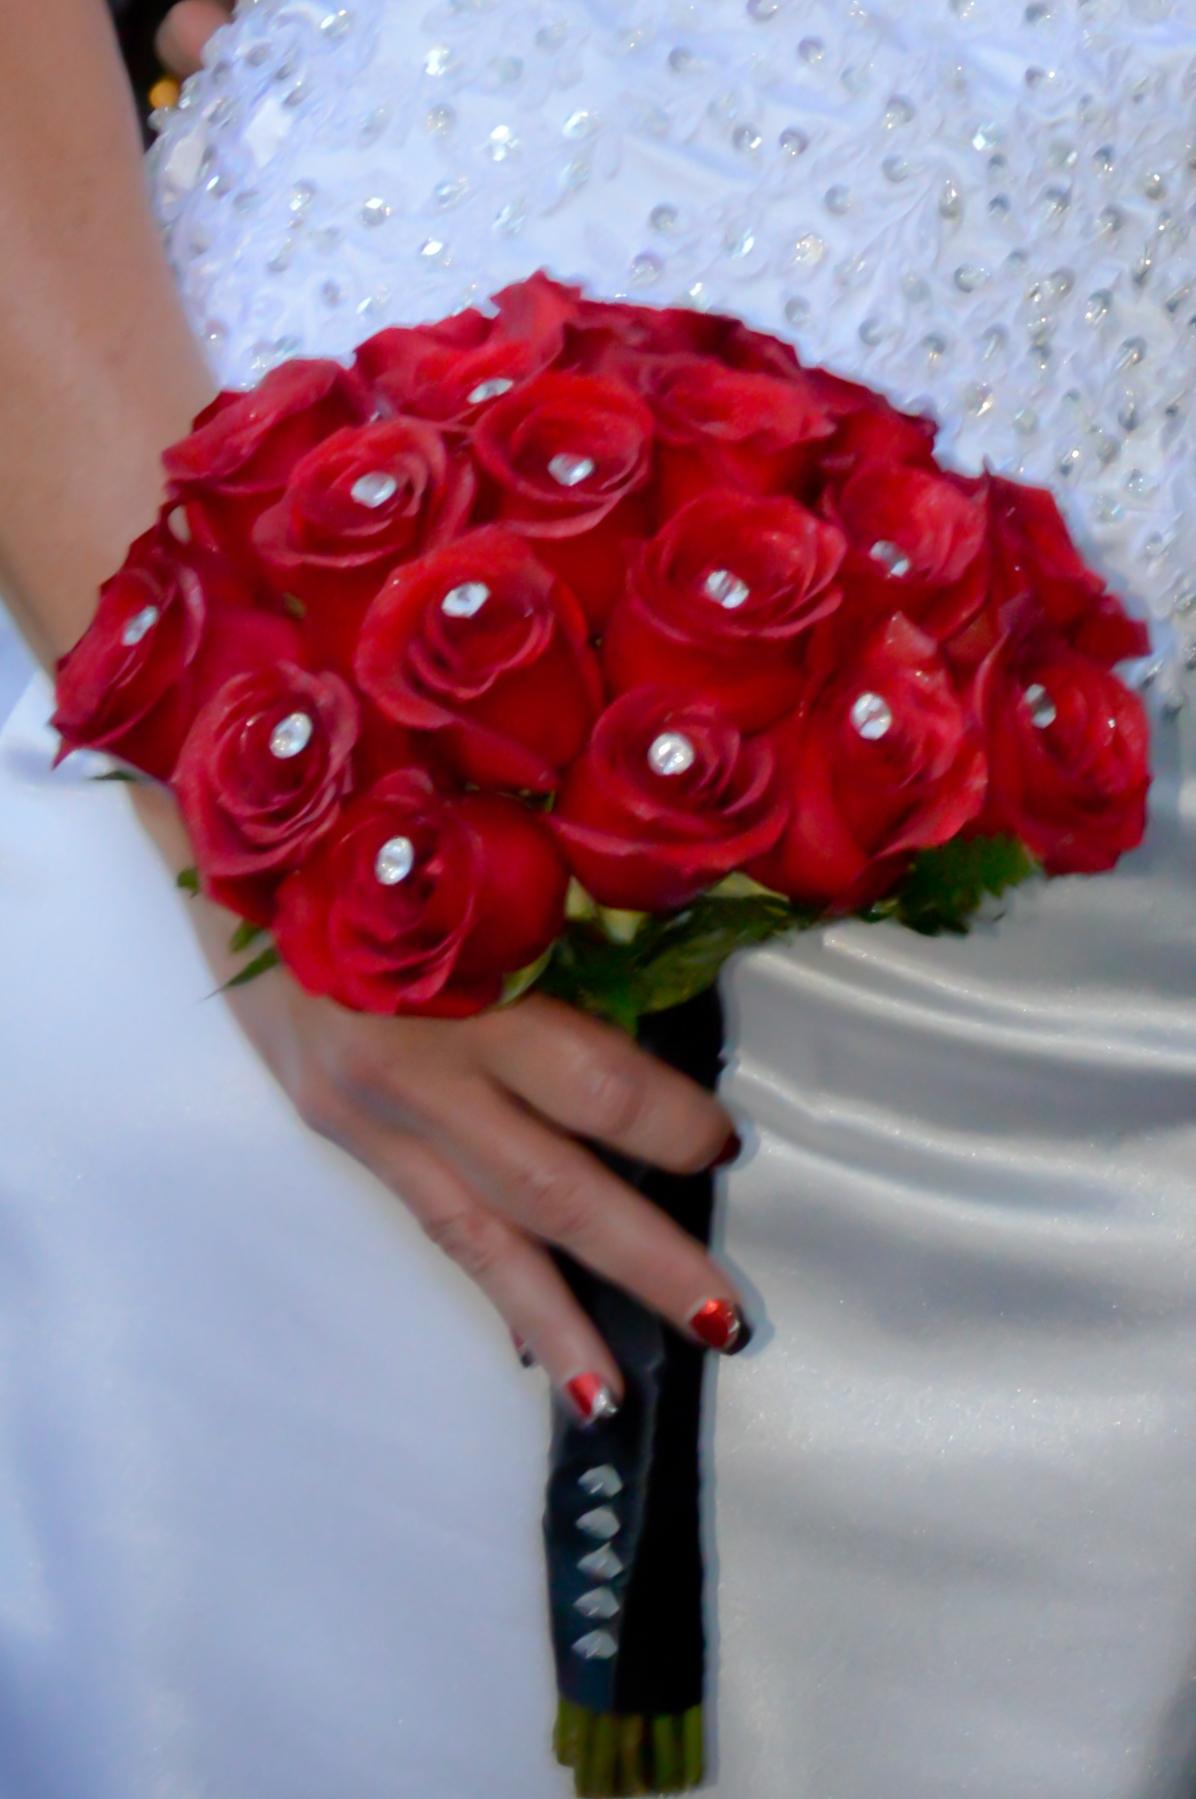 18 rose hand tied bridal bouquets las vegas weddings 18 rose hand tied bridal bouquet with fresh red roses izmirmasajfo